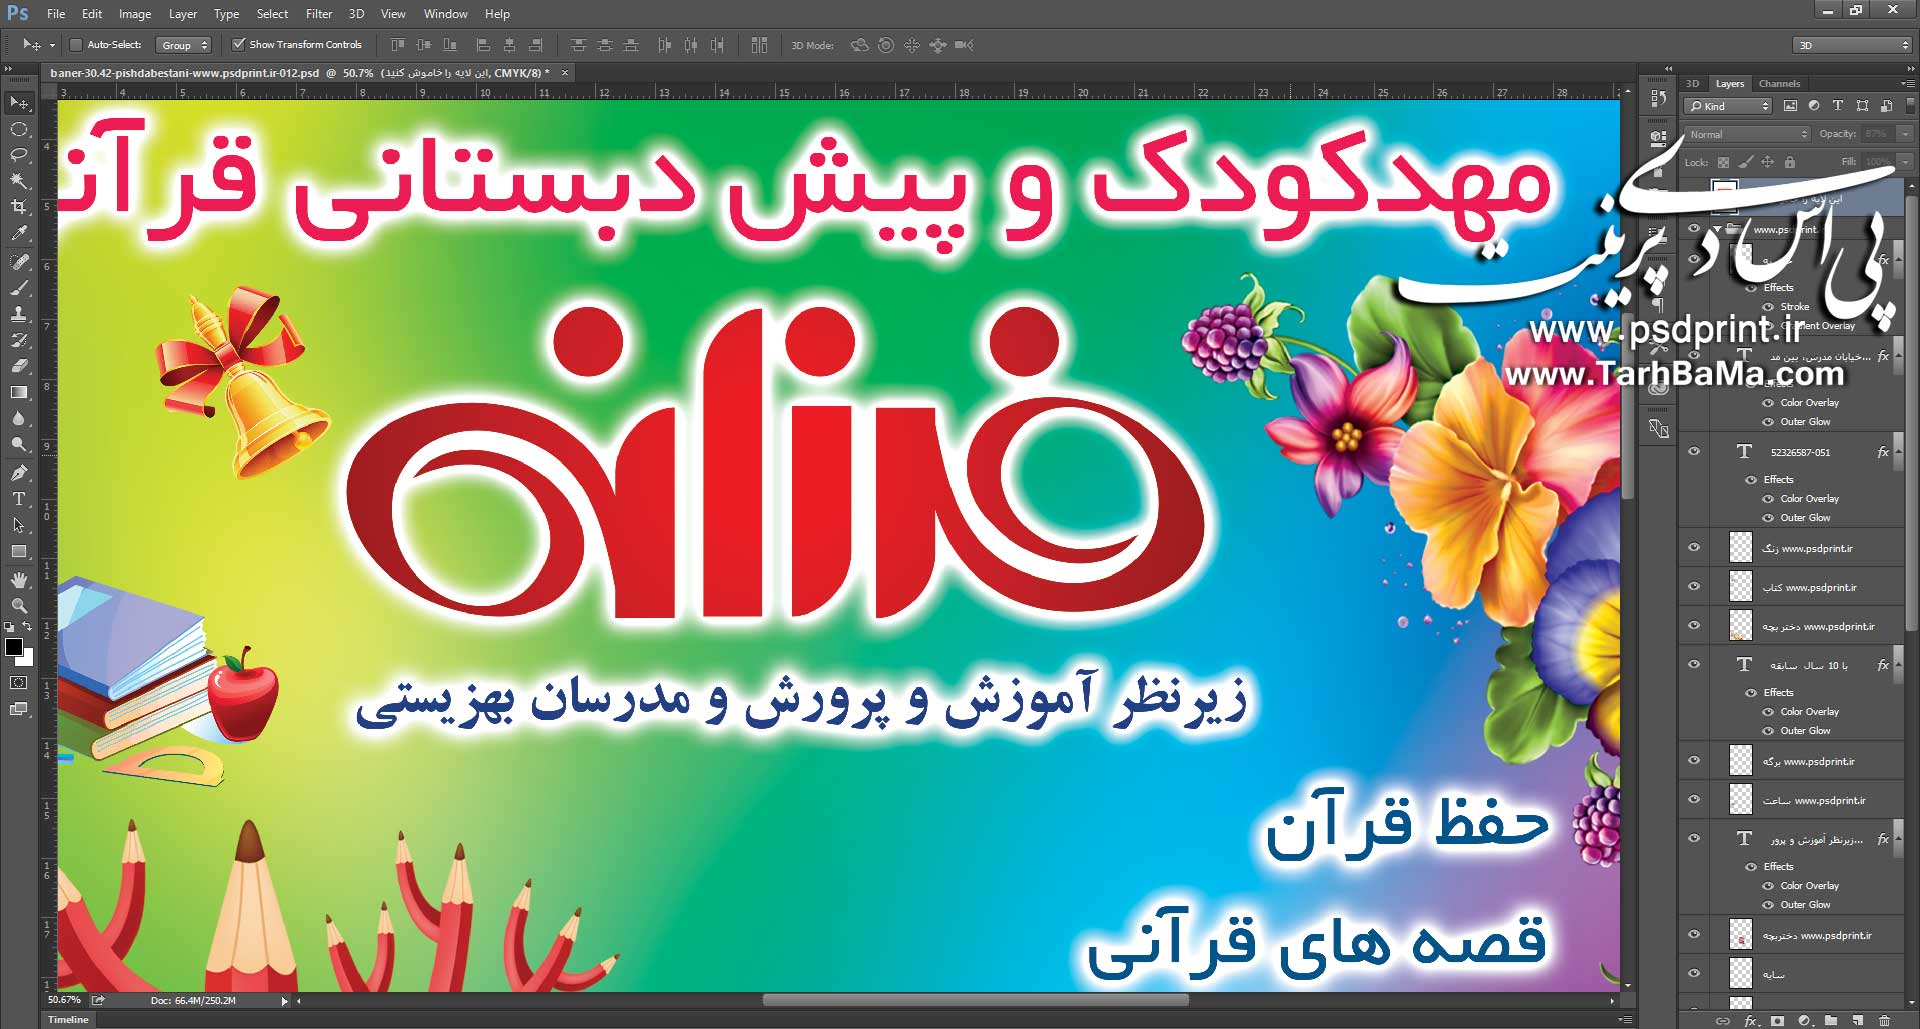 بنر+مهد+قرآنی